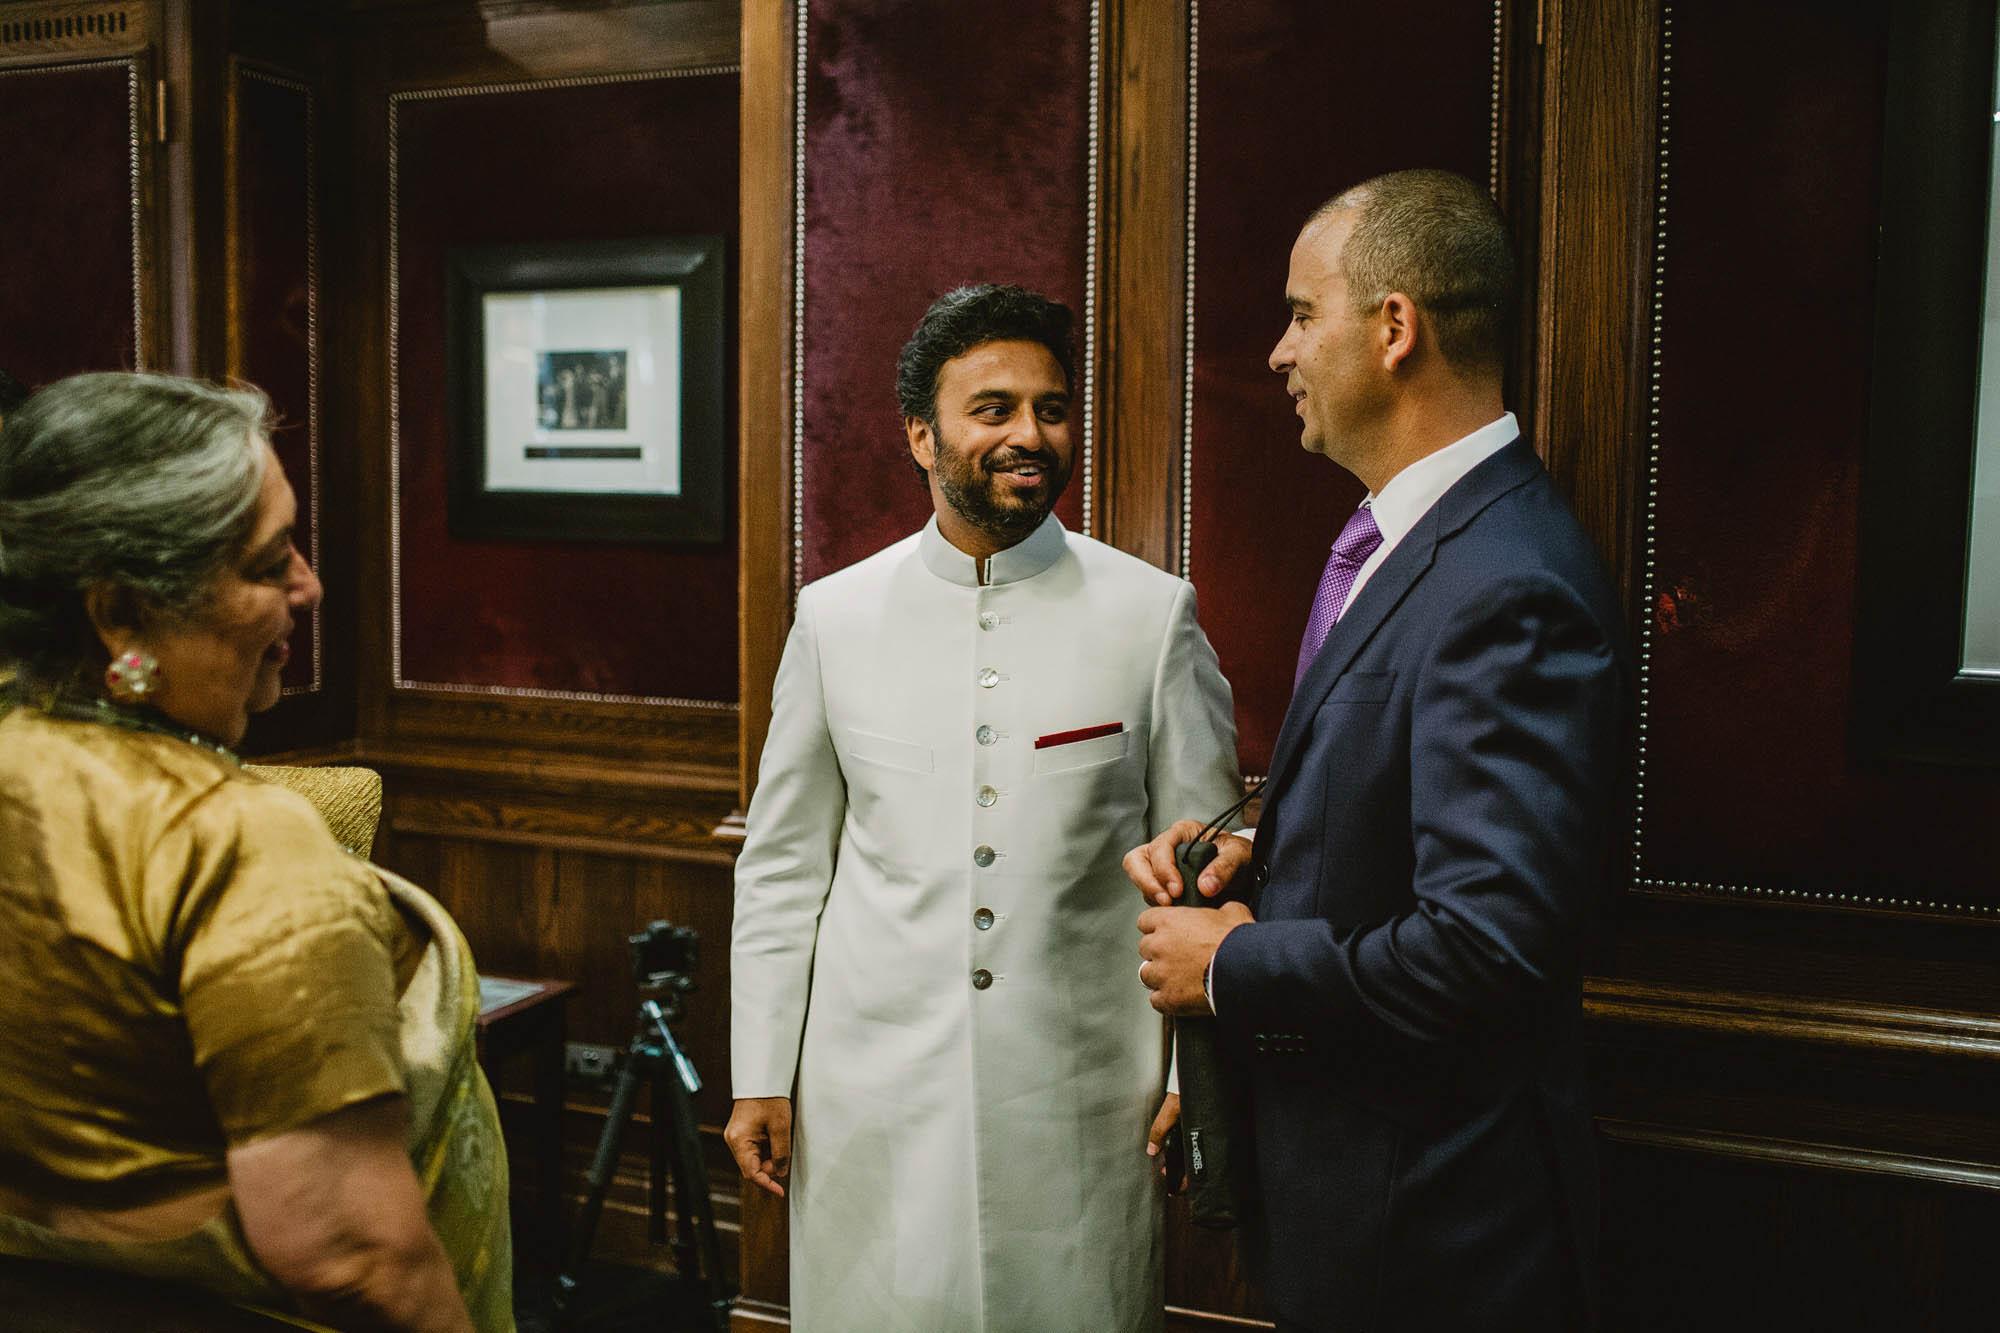 Goring hotel London wedding 2